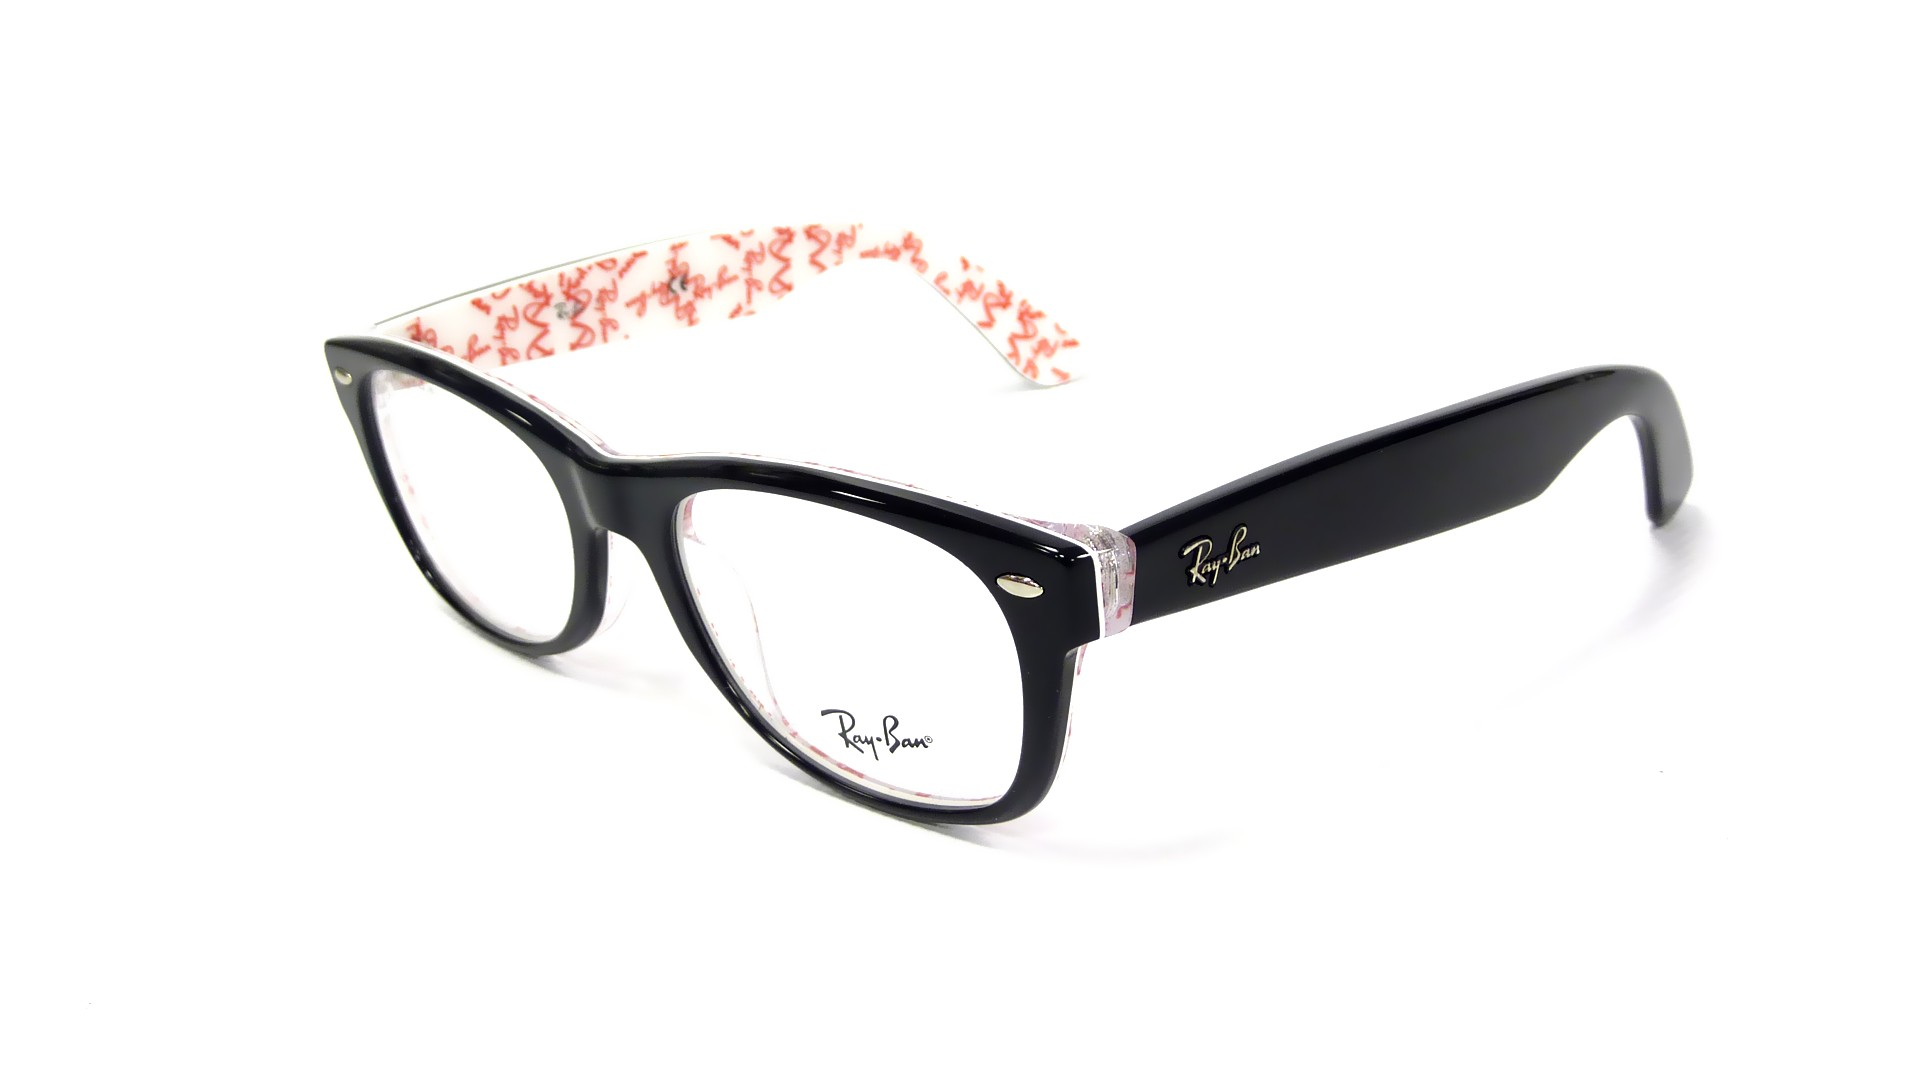 lunettes ray ban rx5184 new wayfarer small. Black Bedroom Furniture Sets. Home Design Ideas